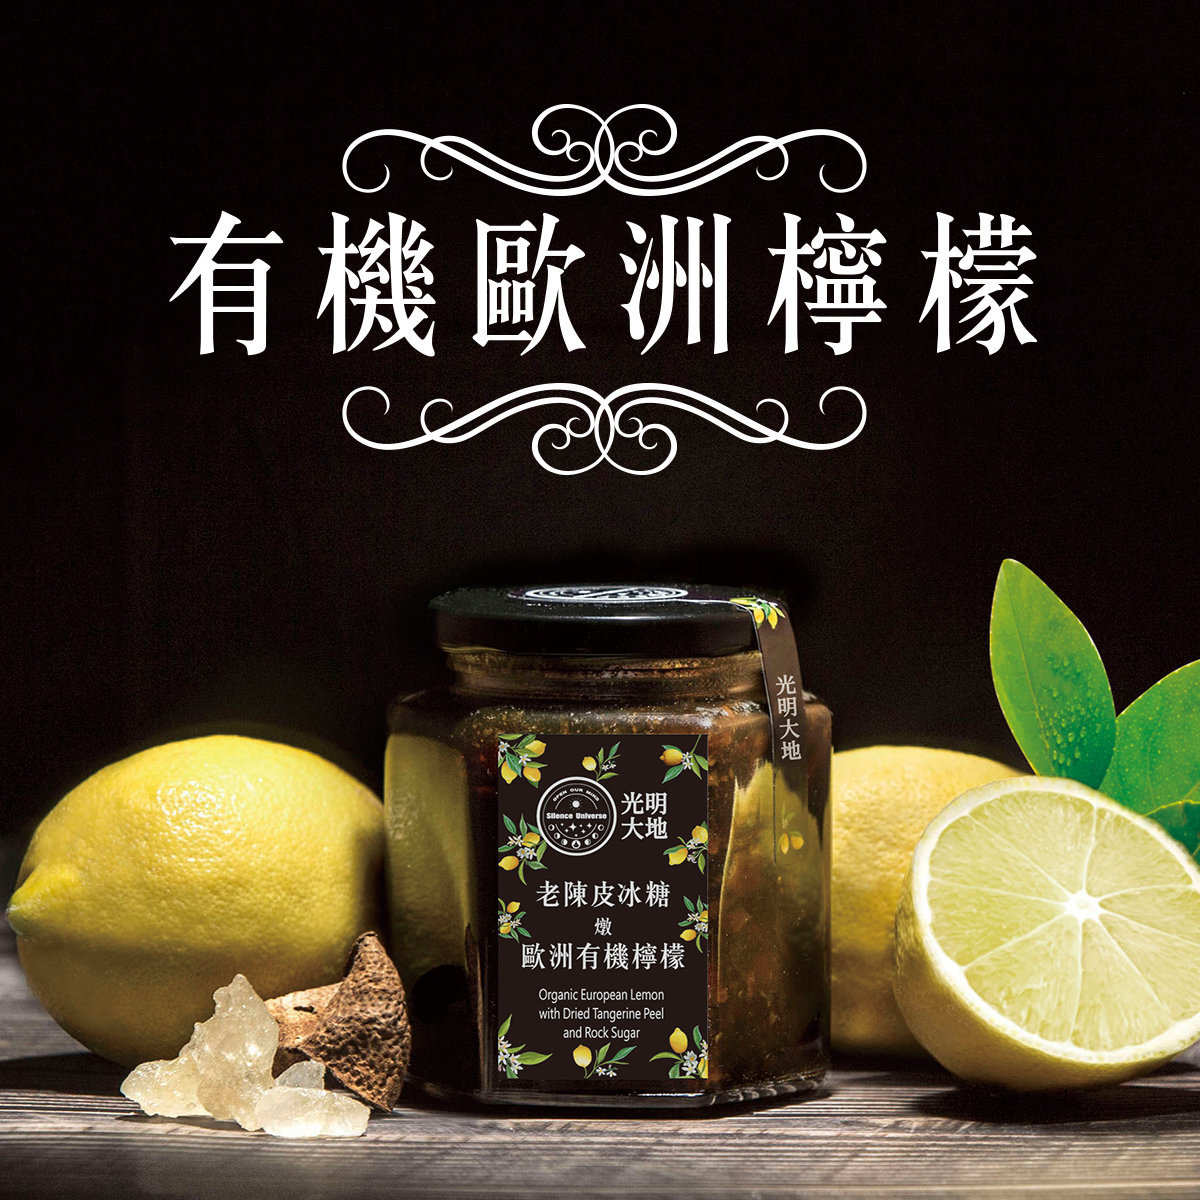 Organic European Lemon with Dried Aged Tangerine Peel and Rock Sugar [1Bottle]